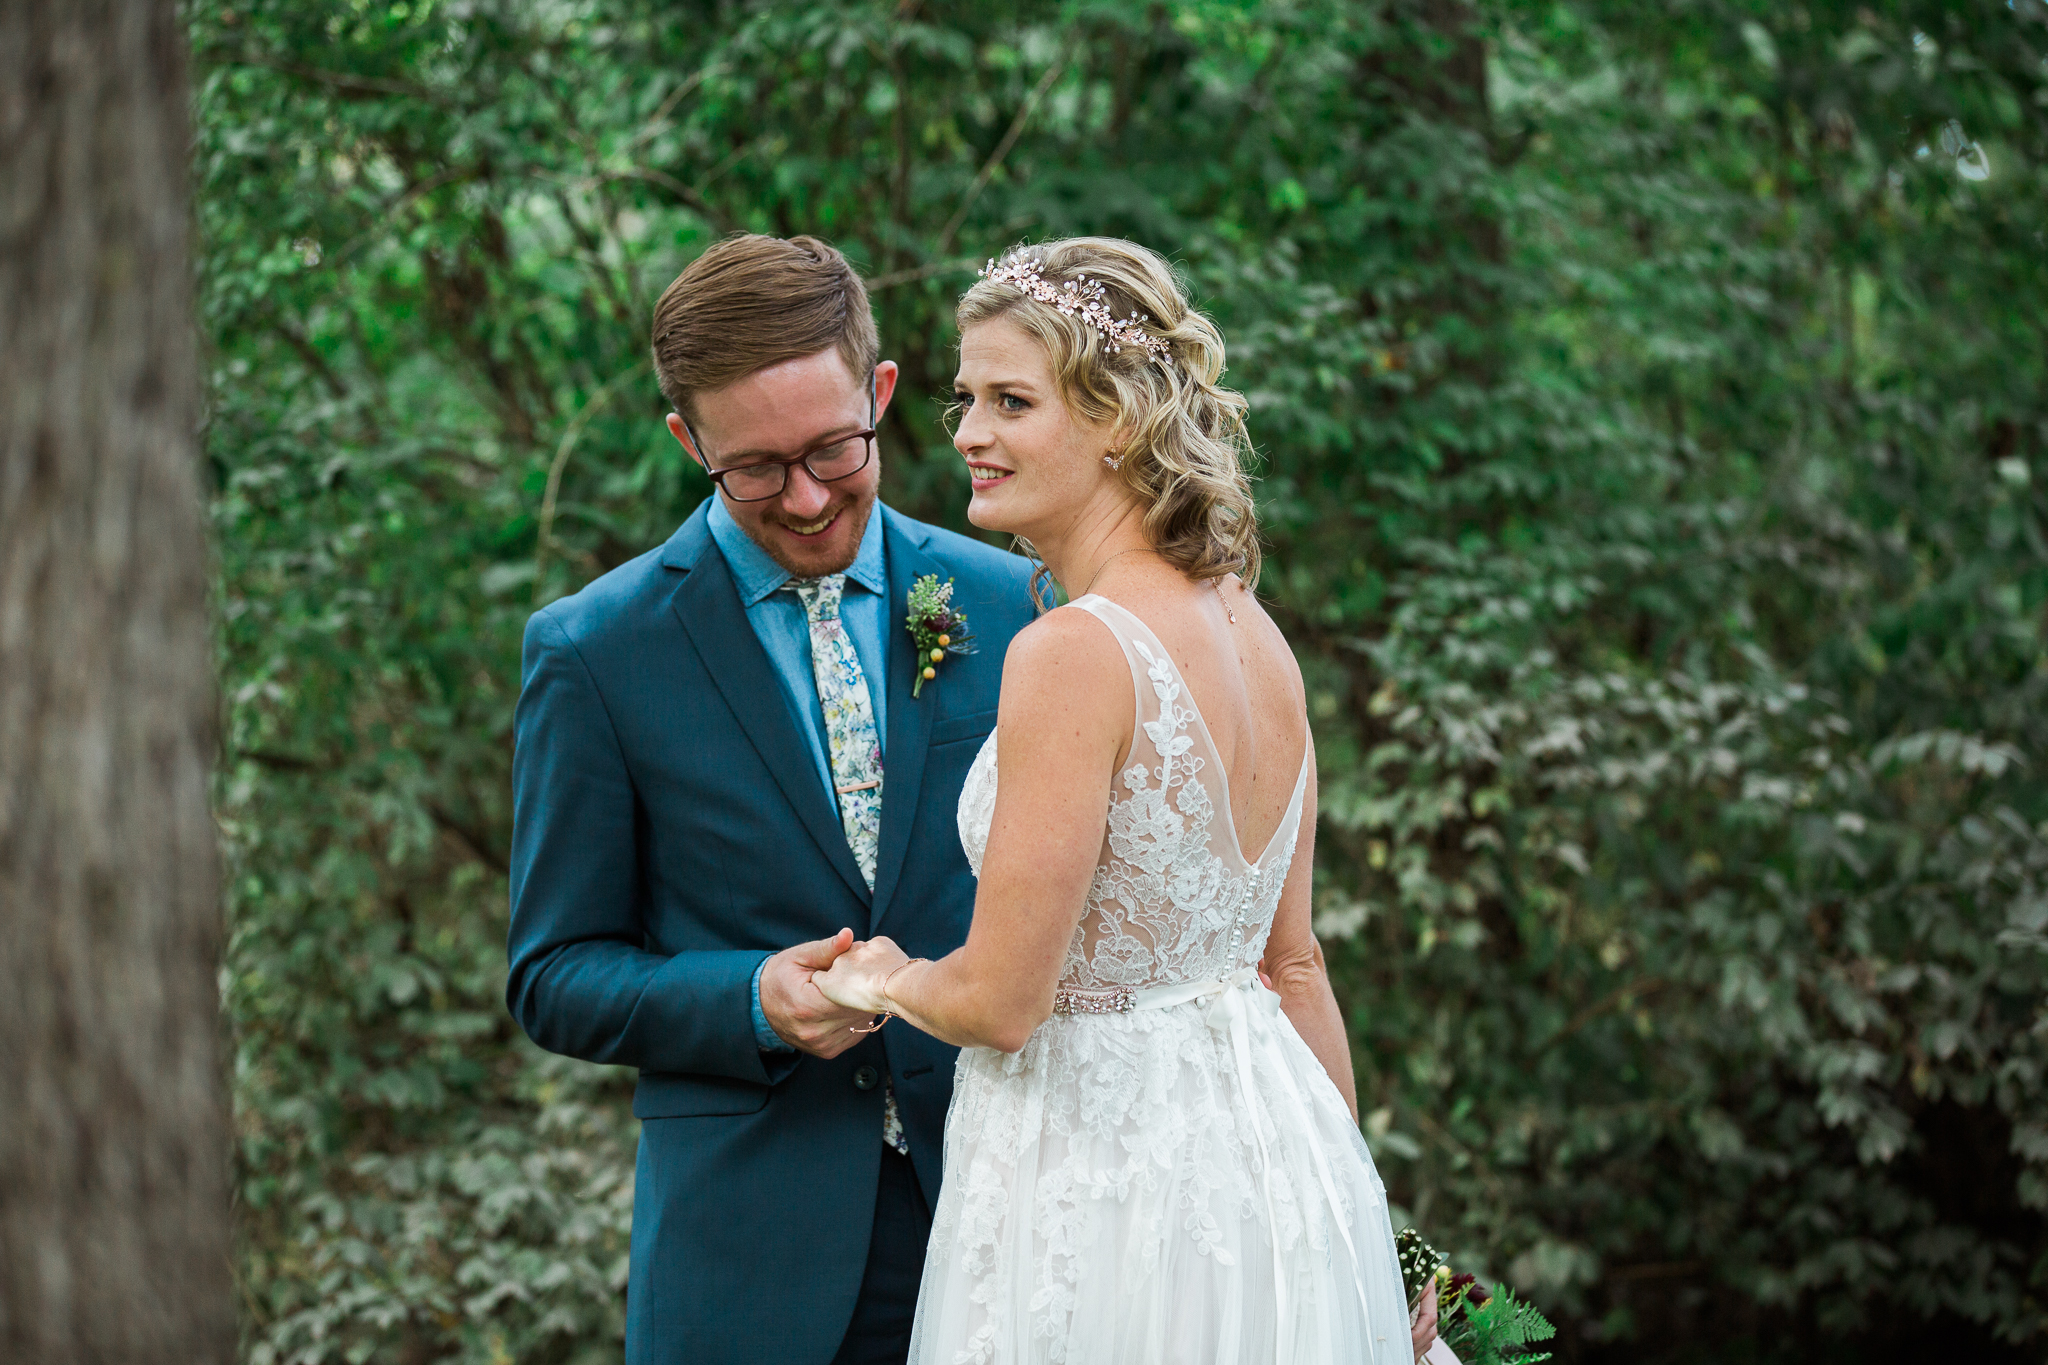 Paoli-Mill-wedding-summer-Wisconsin_047.jpg